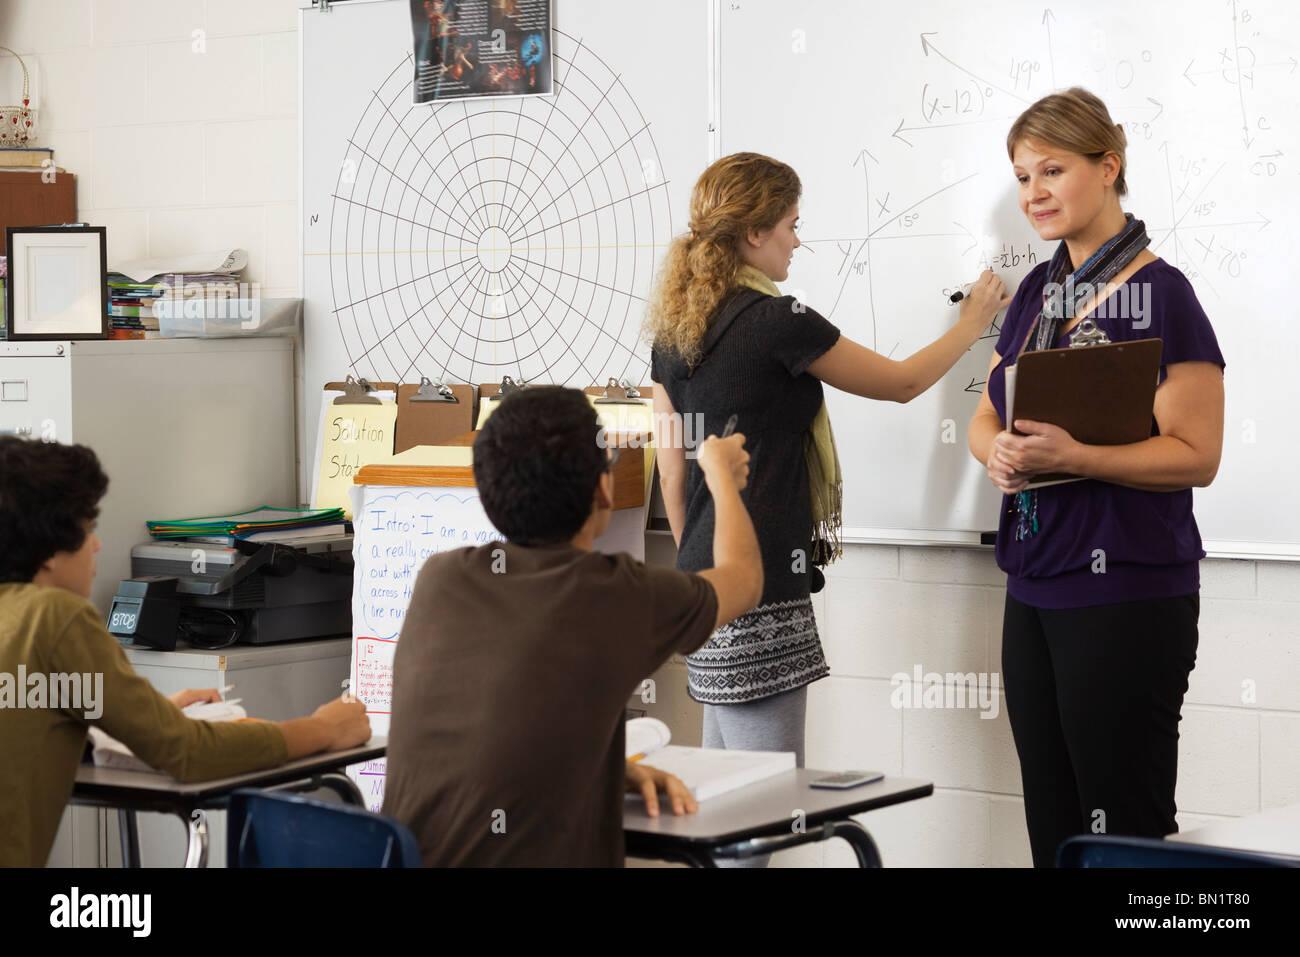 Woman teaching high school mathematics class - Stock Image